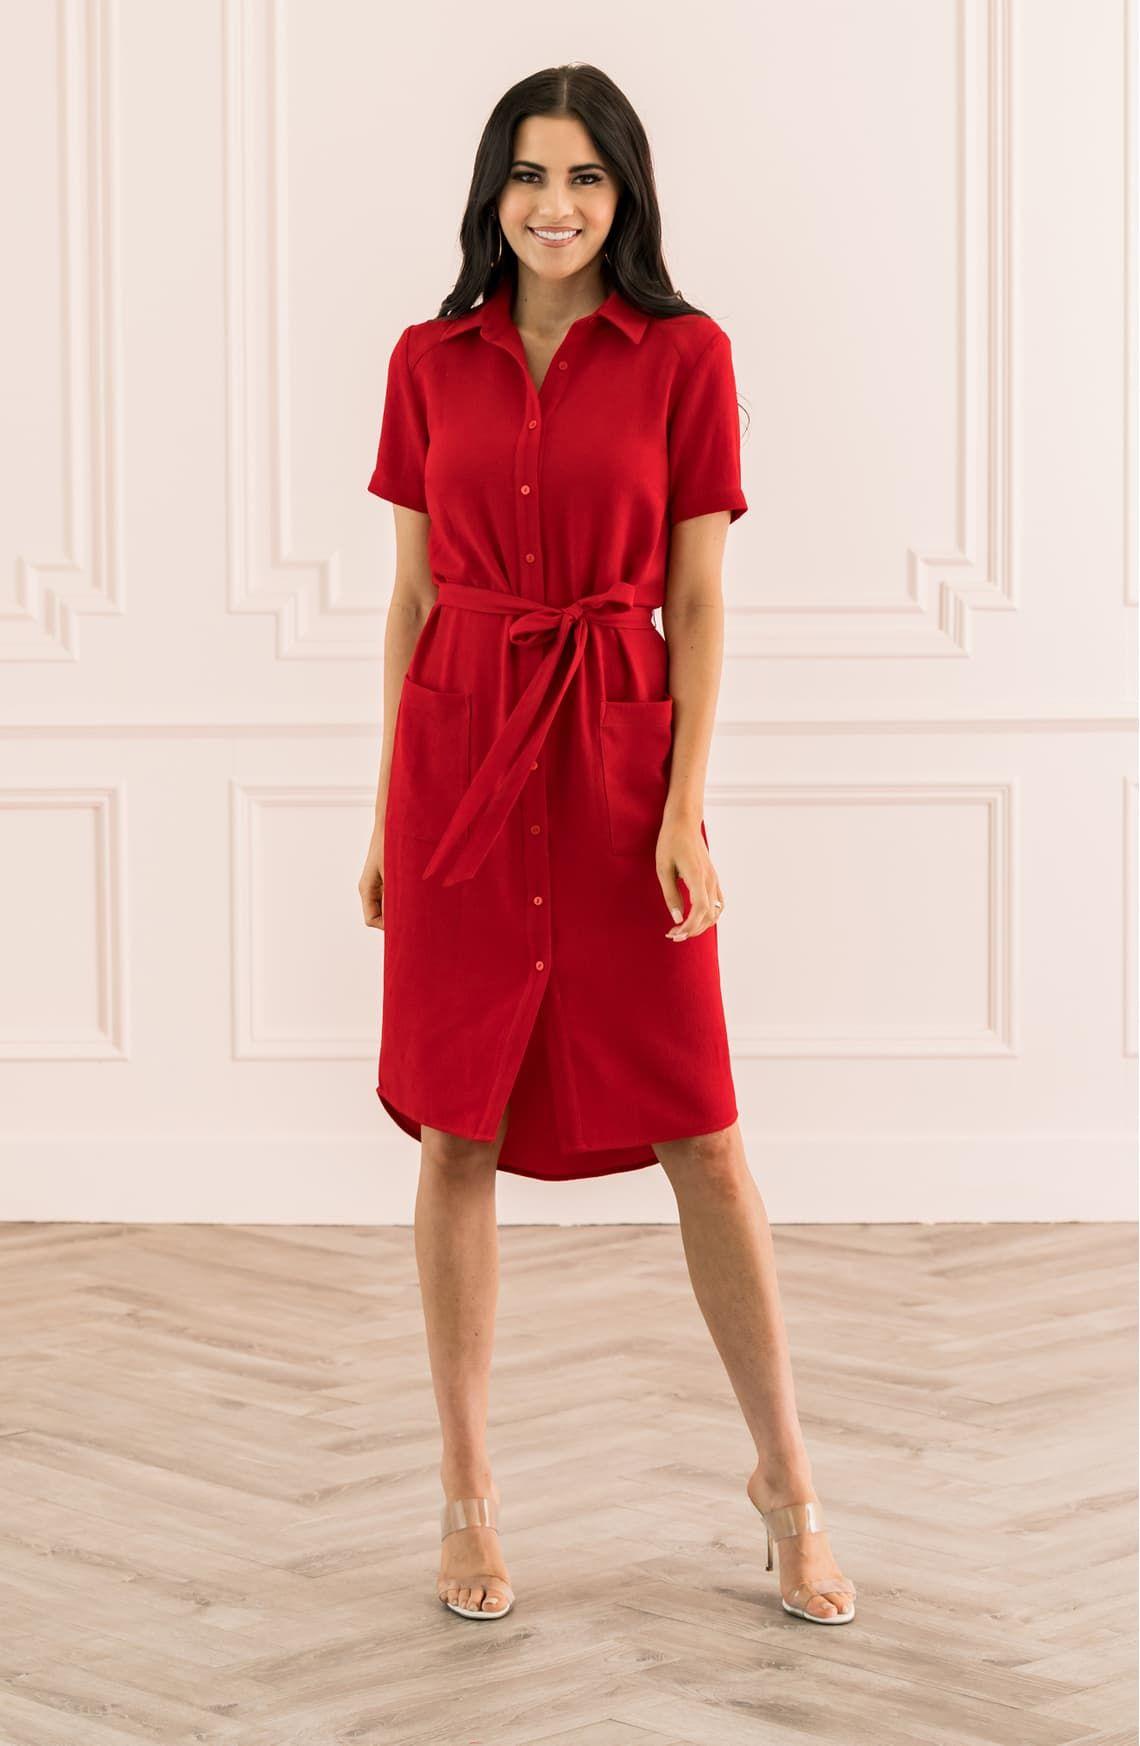 Rachel Parcell Everyday High Low Shirt Dress Nordstrom Exclusive Nordstrom High Low Shirt Dress Shirt Dress Petite Fashion Short [ 1746 x 1140 Pixel ]